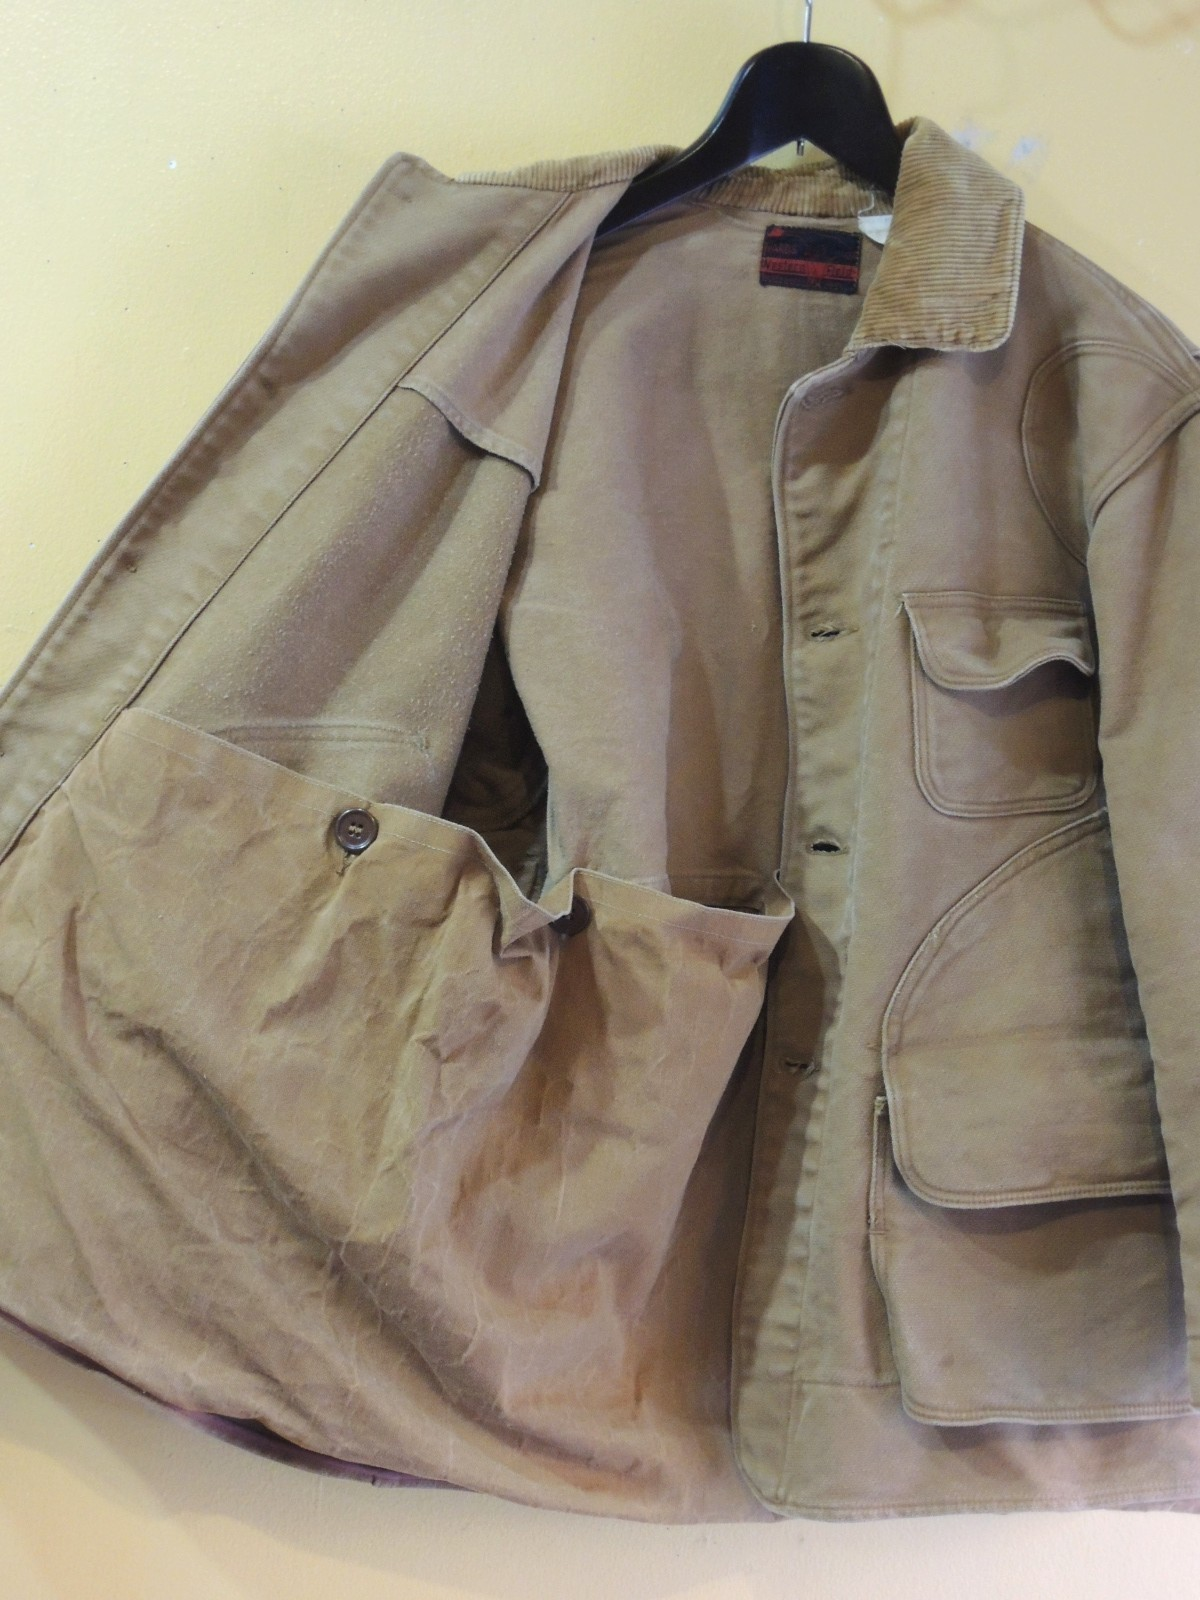 westernfieldmontgomerywardhuntinngjacket012.JPG